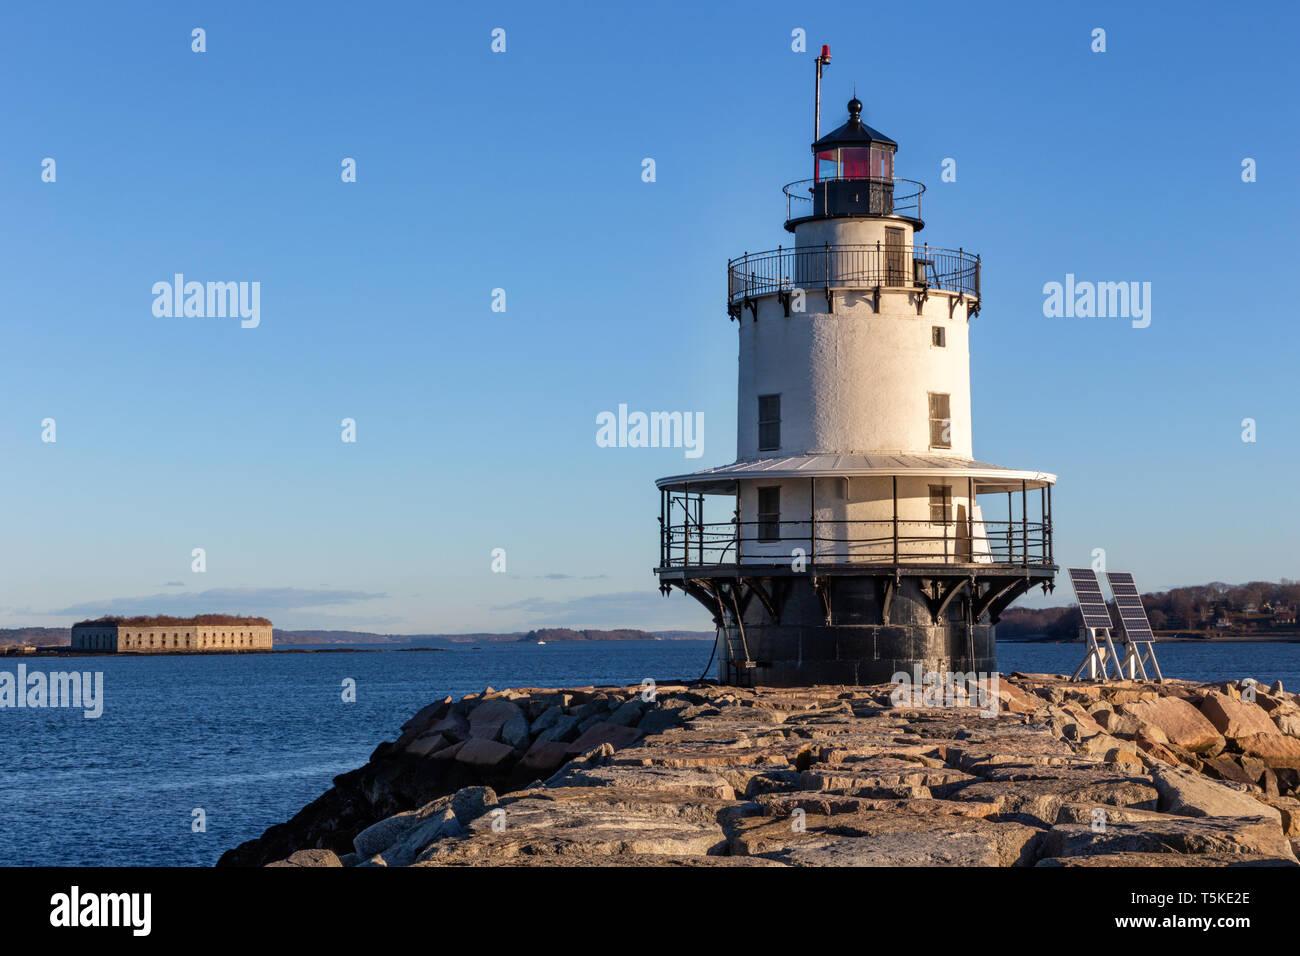 Spring Point Ledge Lighthouse, South Portland, Maine - Stock Image